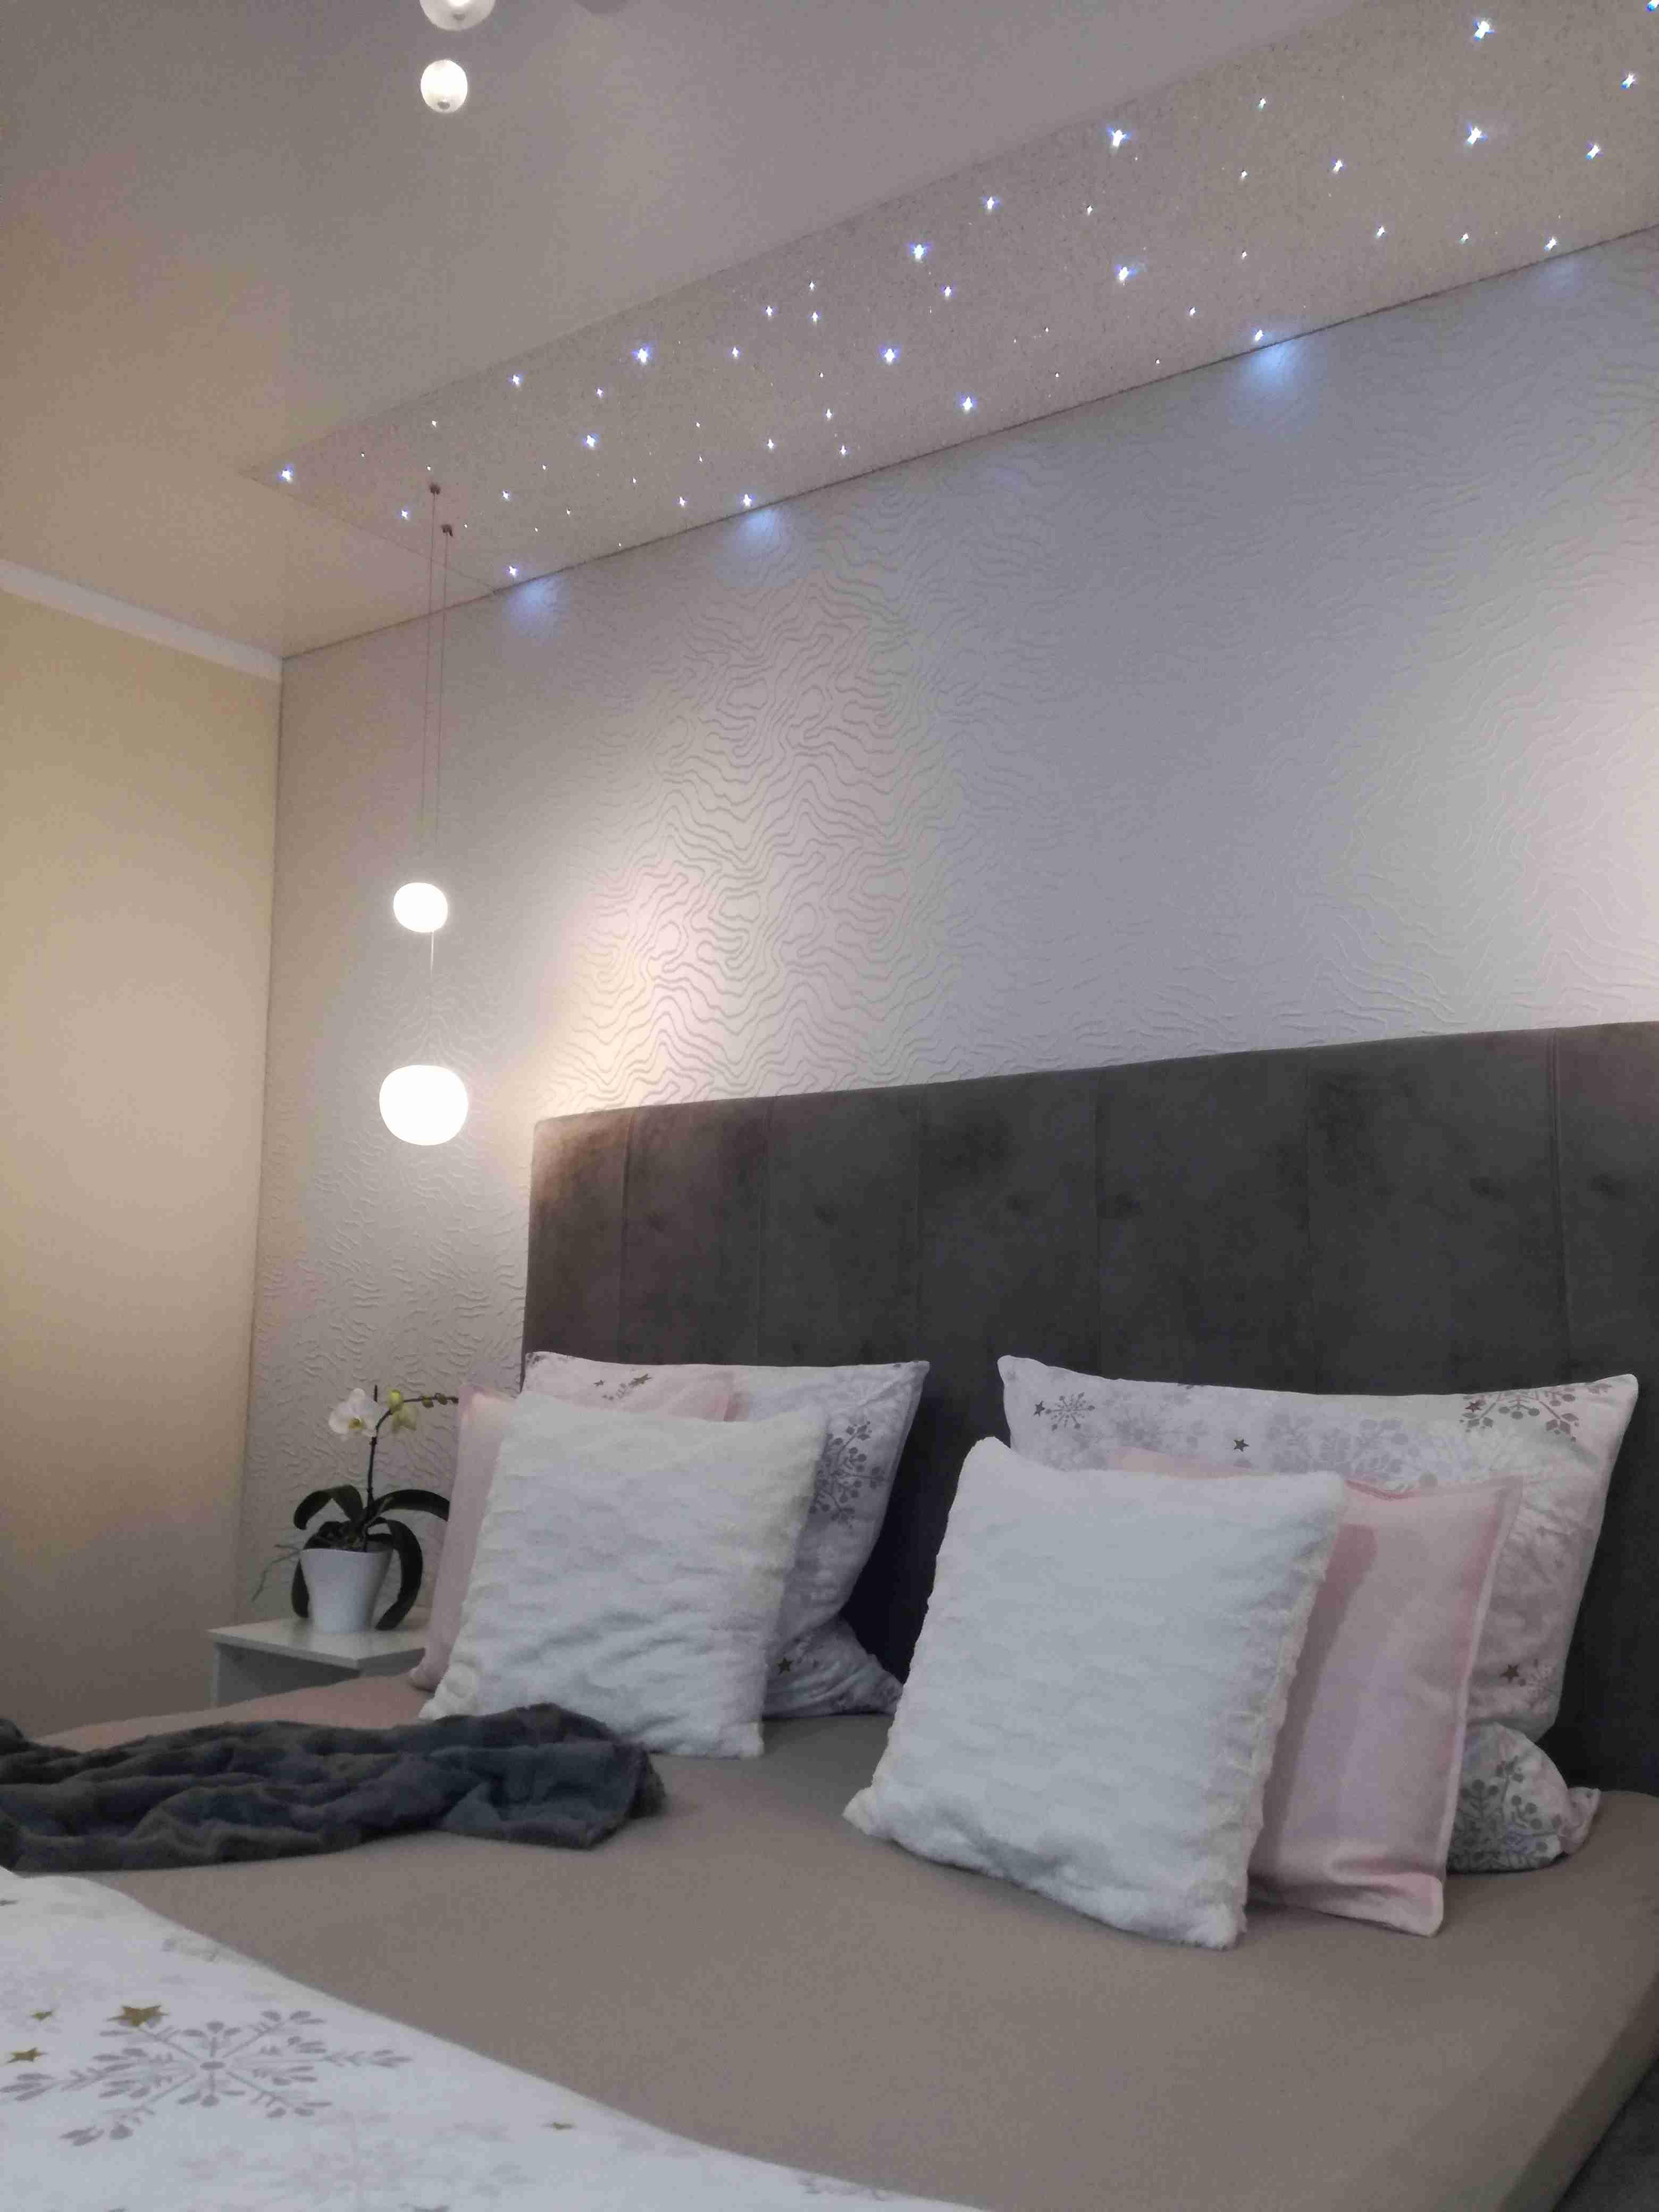 Schlafzimmer Leuchte Sternenhimmel – Caseconrad.com